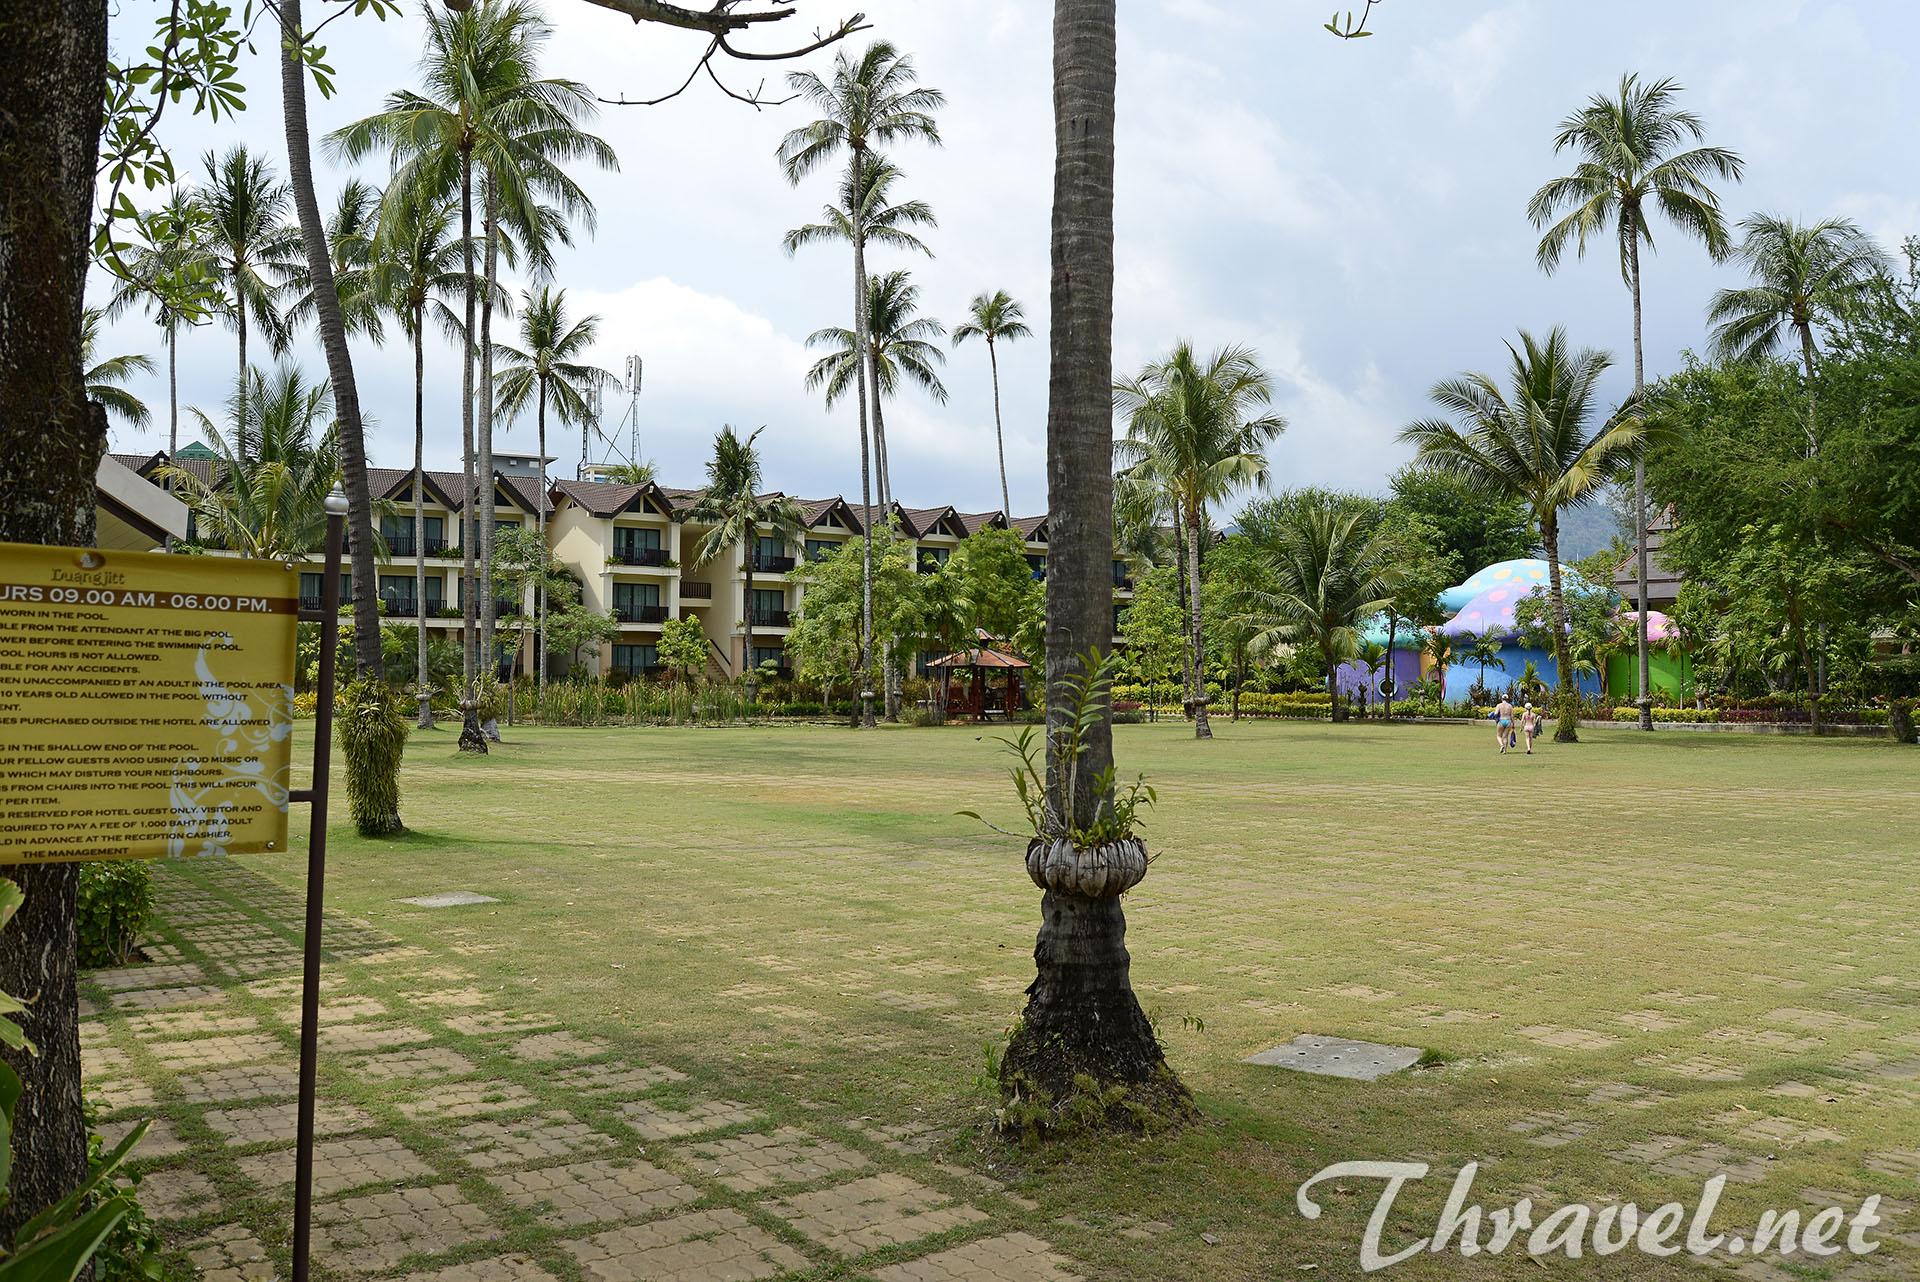 duangjitt-resort-and-spa-hotel-patong-beach-phuket-thailand-17